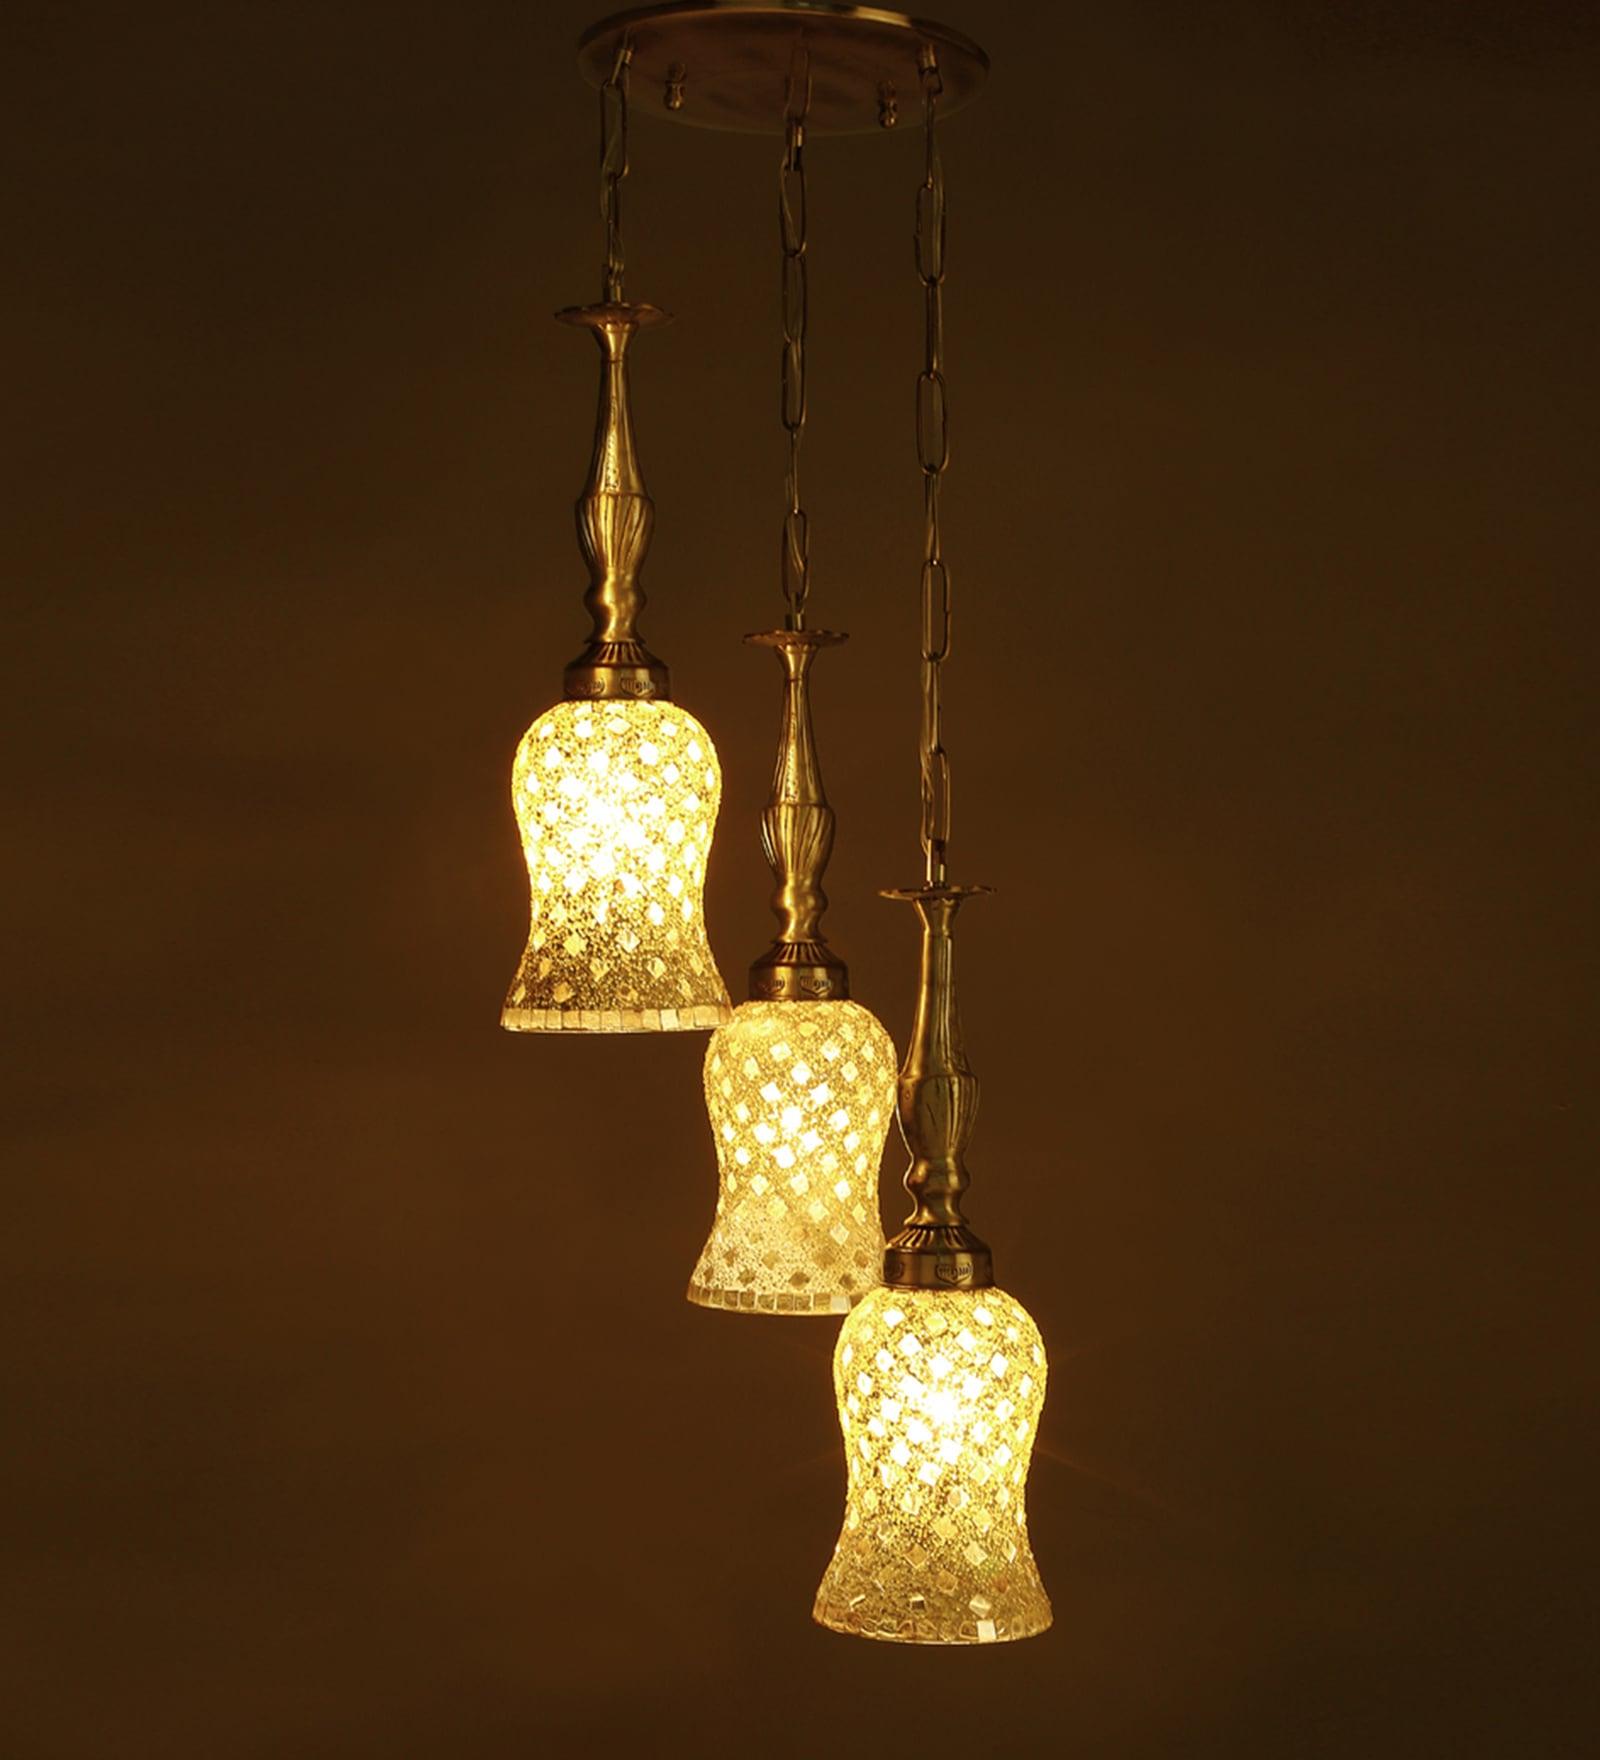 Antique Gold Brass & Glass Hanging Light by Fos Lighting